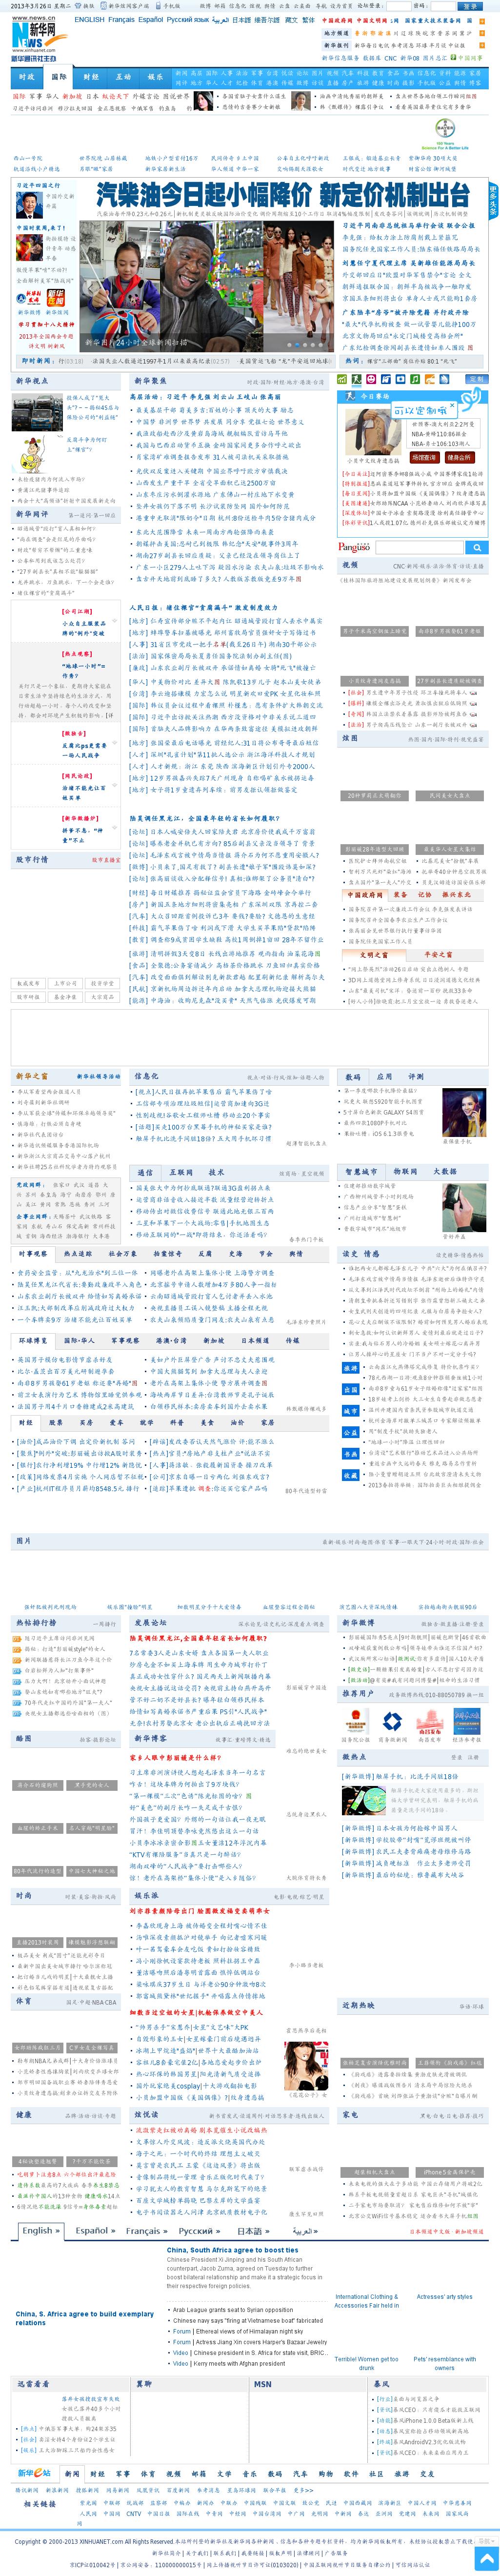 Xinhua at Tuesday March 26, 2013, 7:46 p.m. UTC